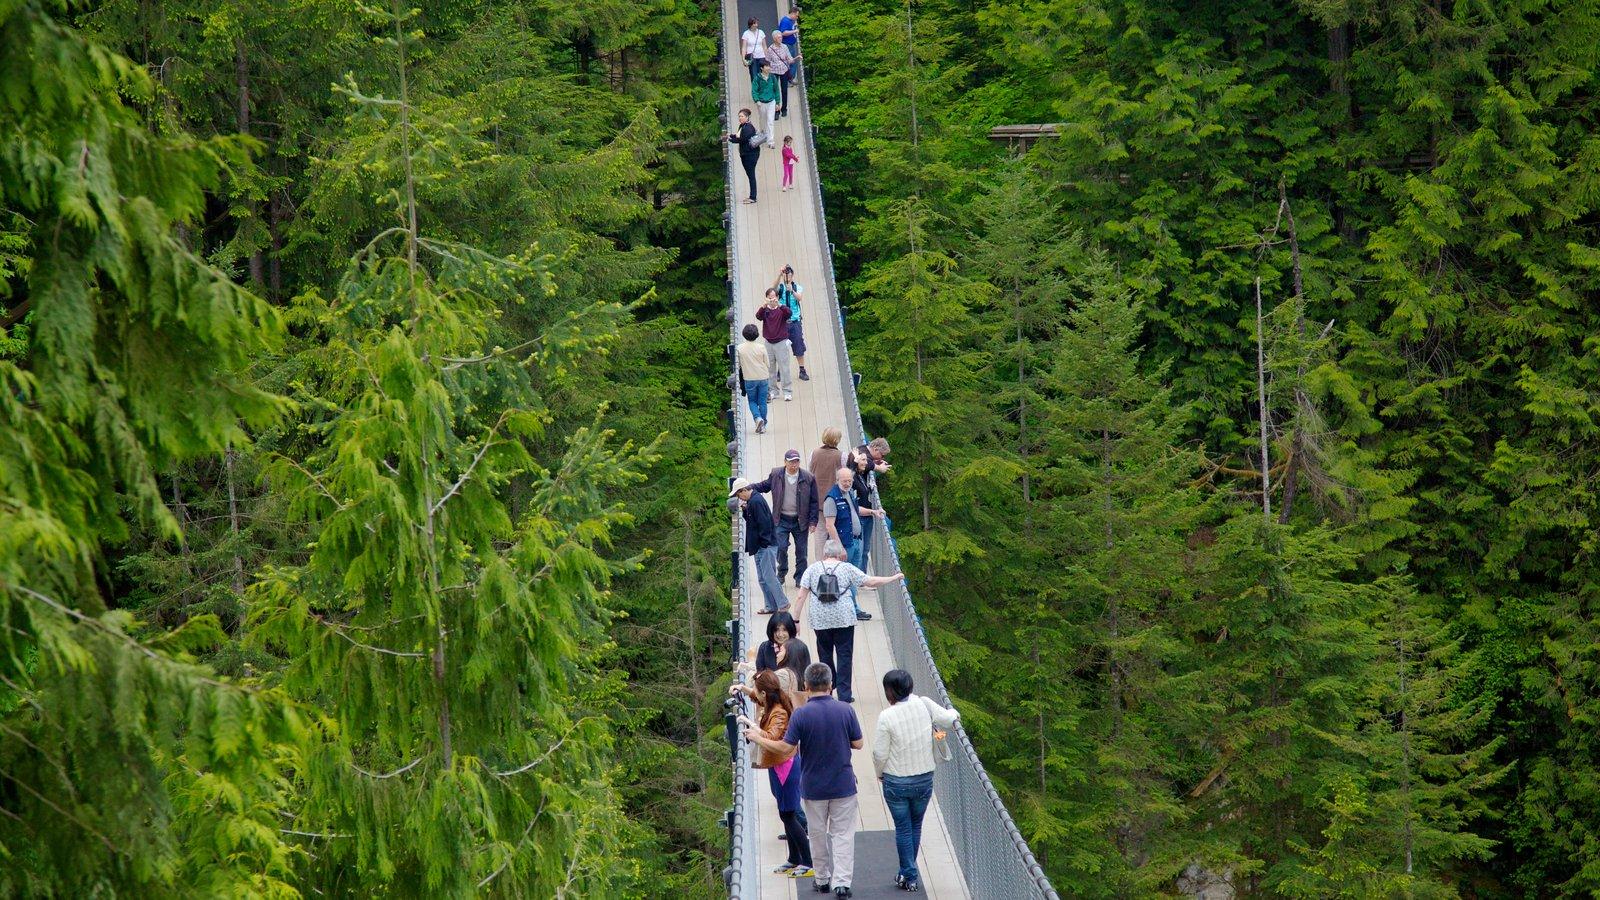 Capilano Suspension Bridge featuring views, a suspension bridge or treetop walkway and forests